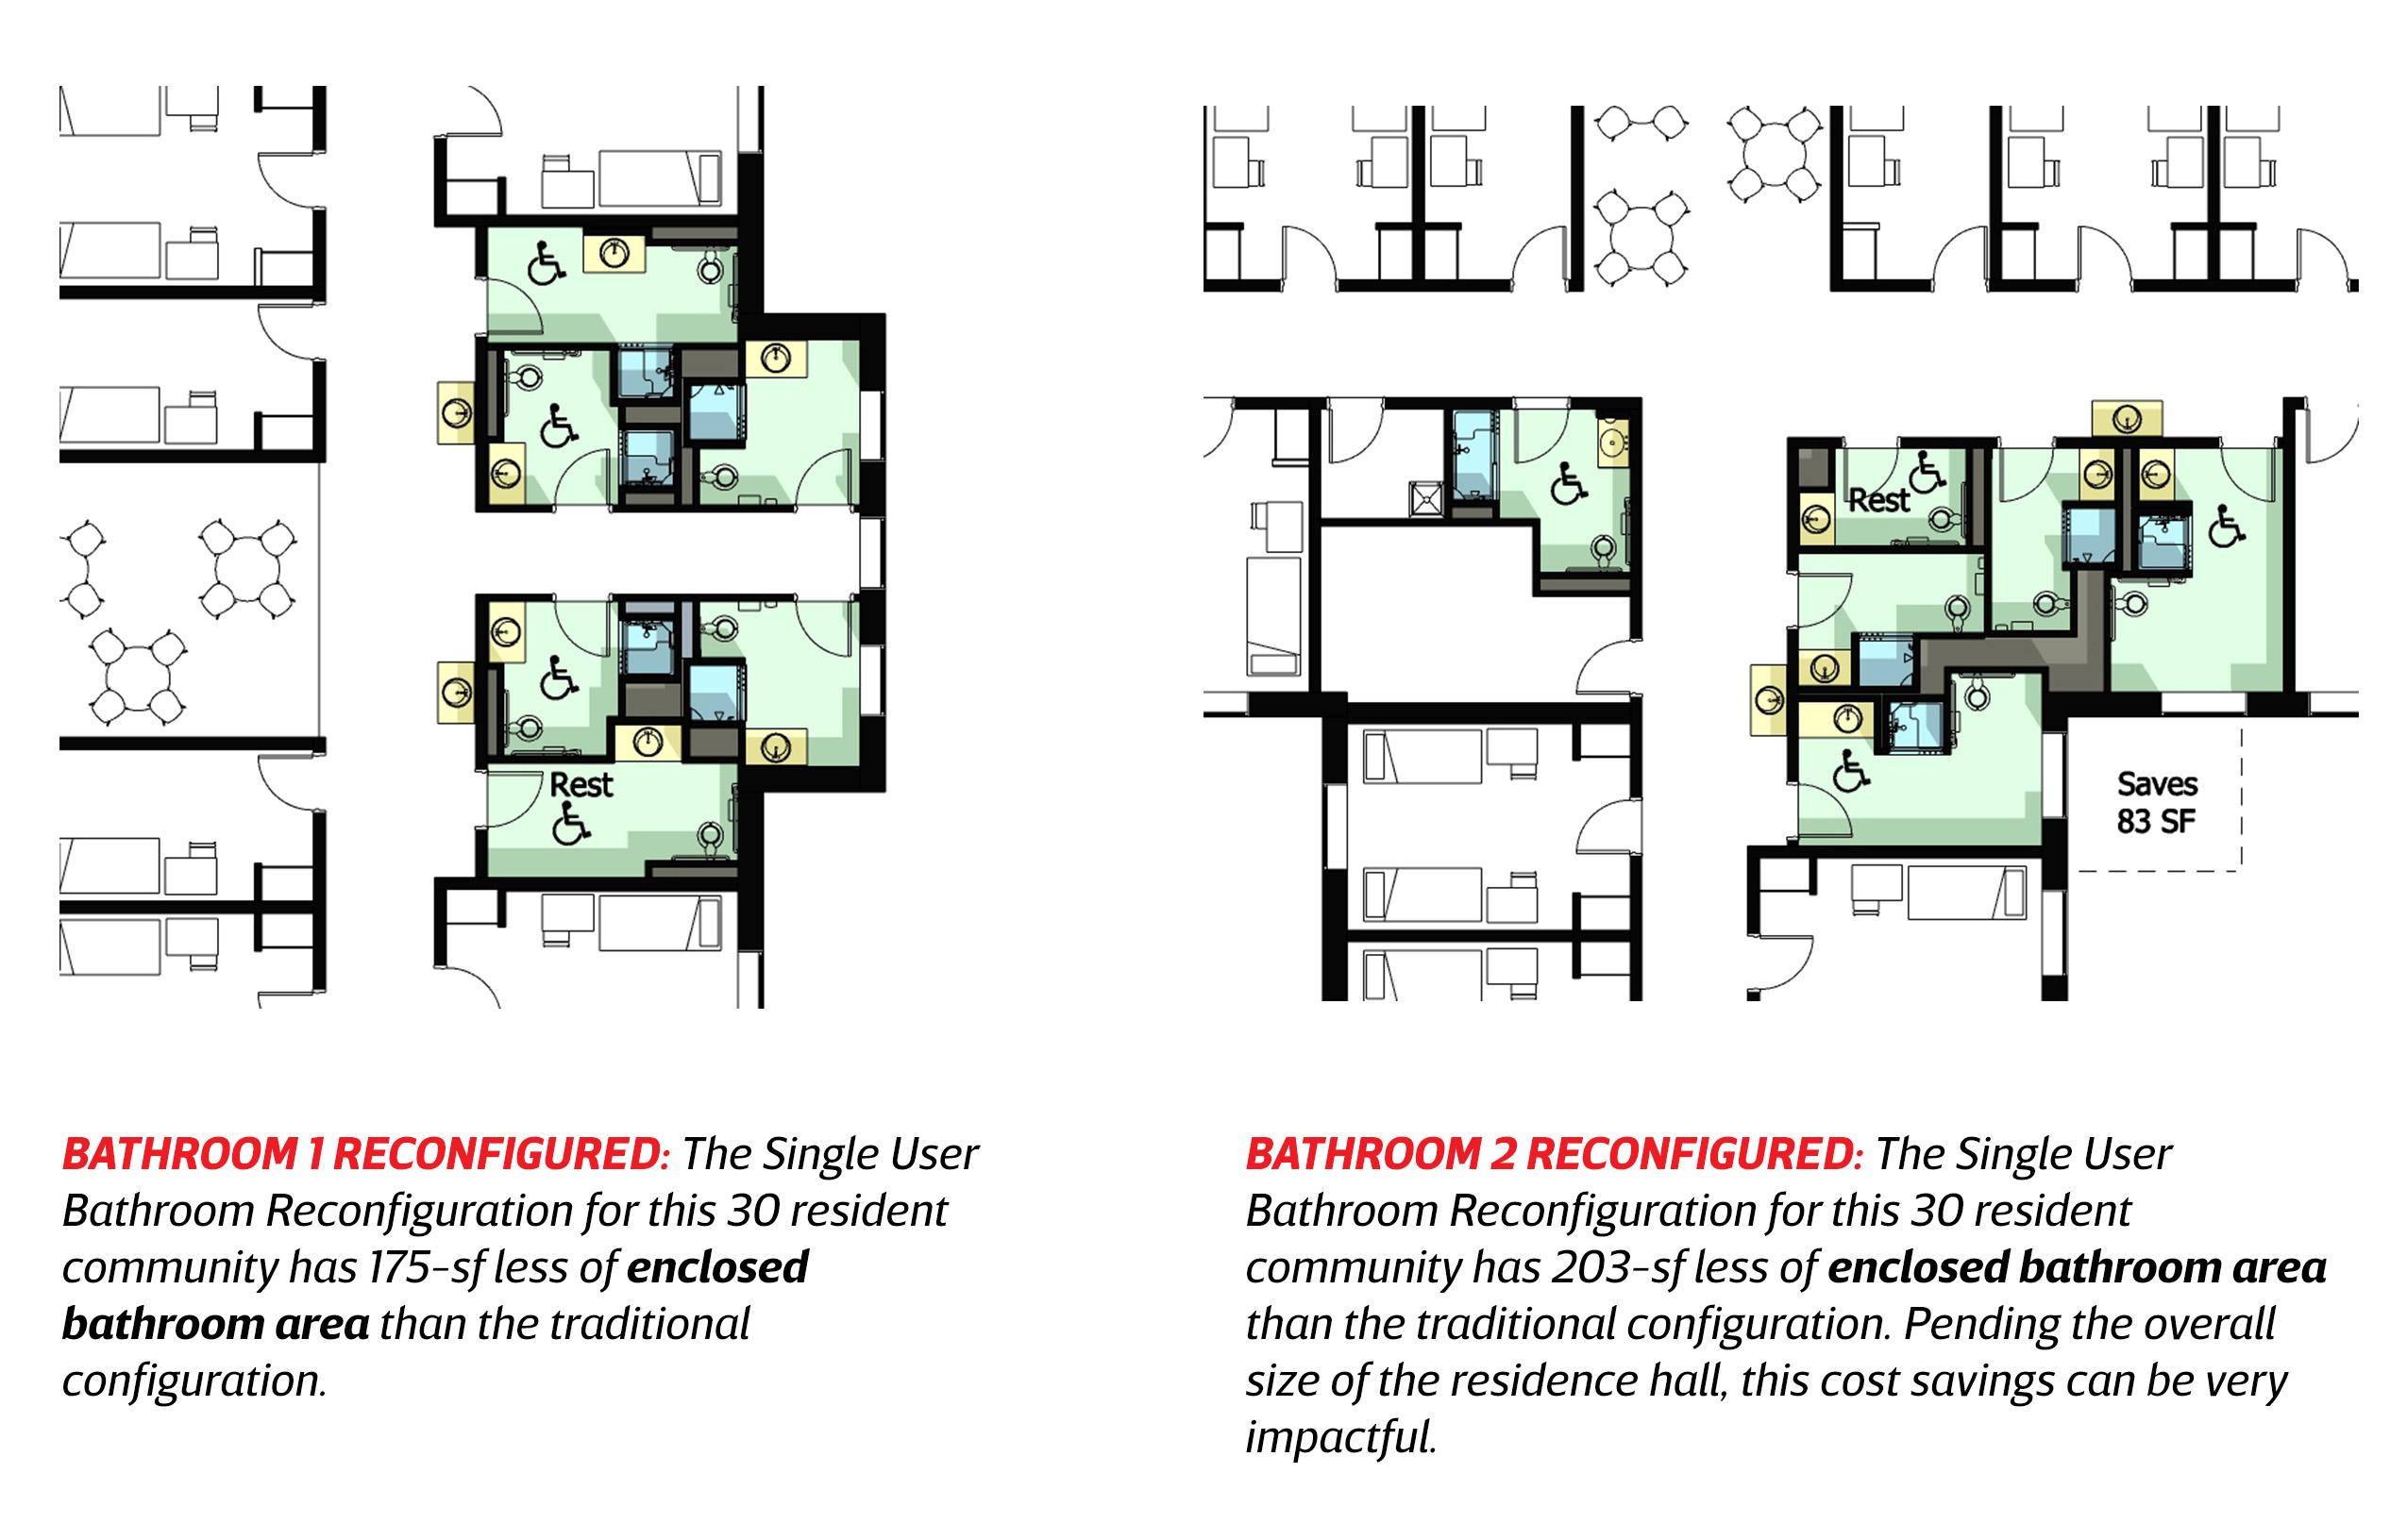 Bathroom configurations_2_3